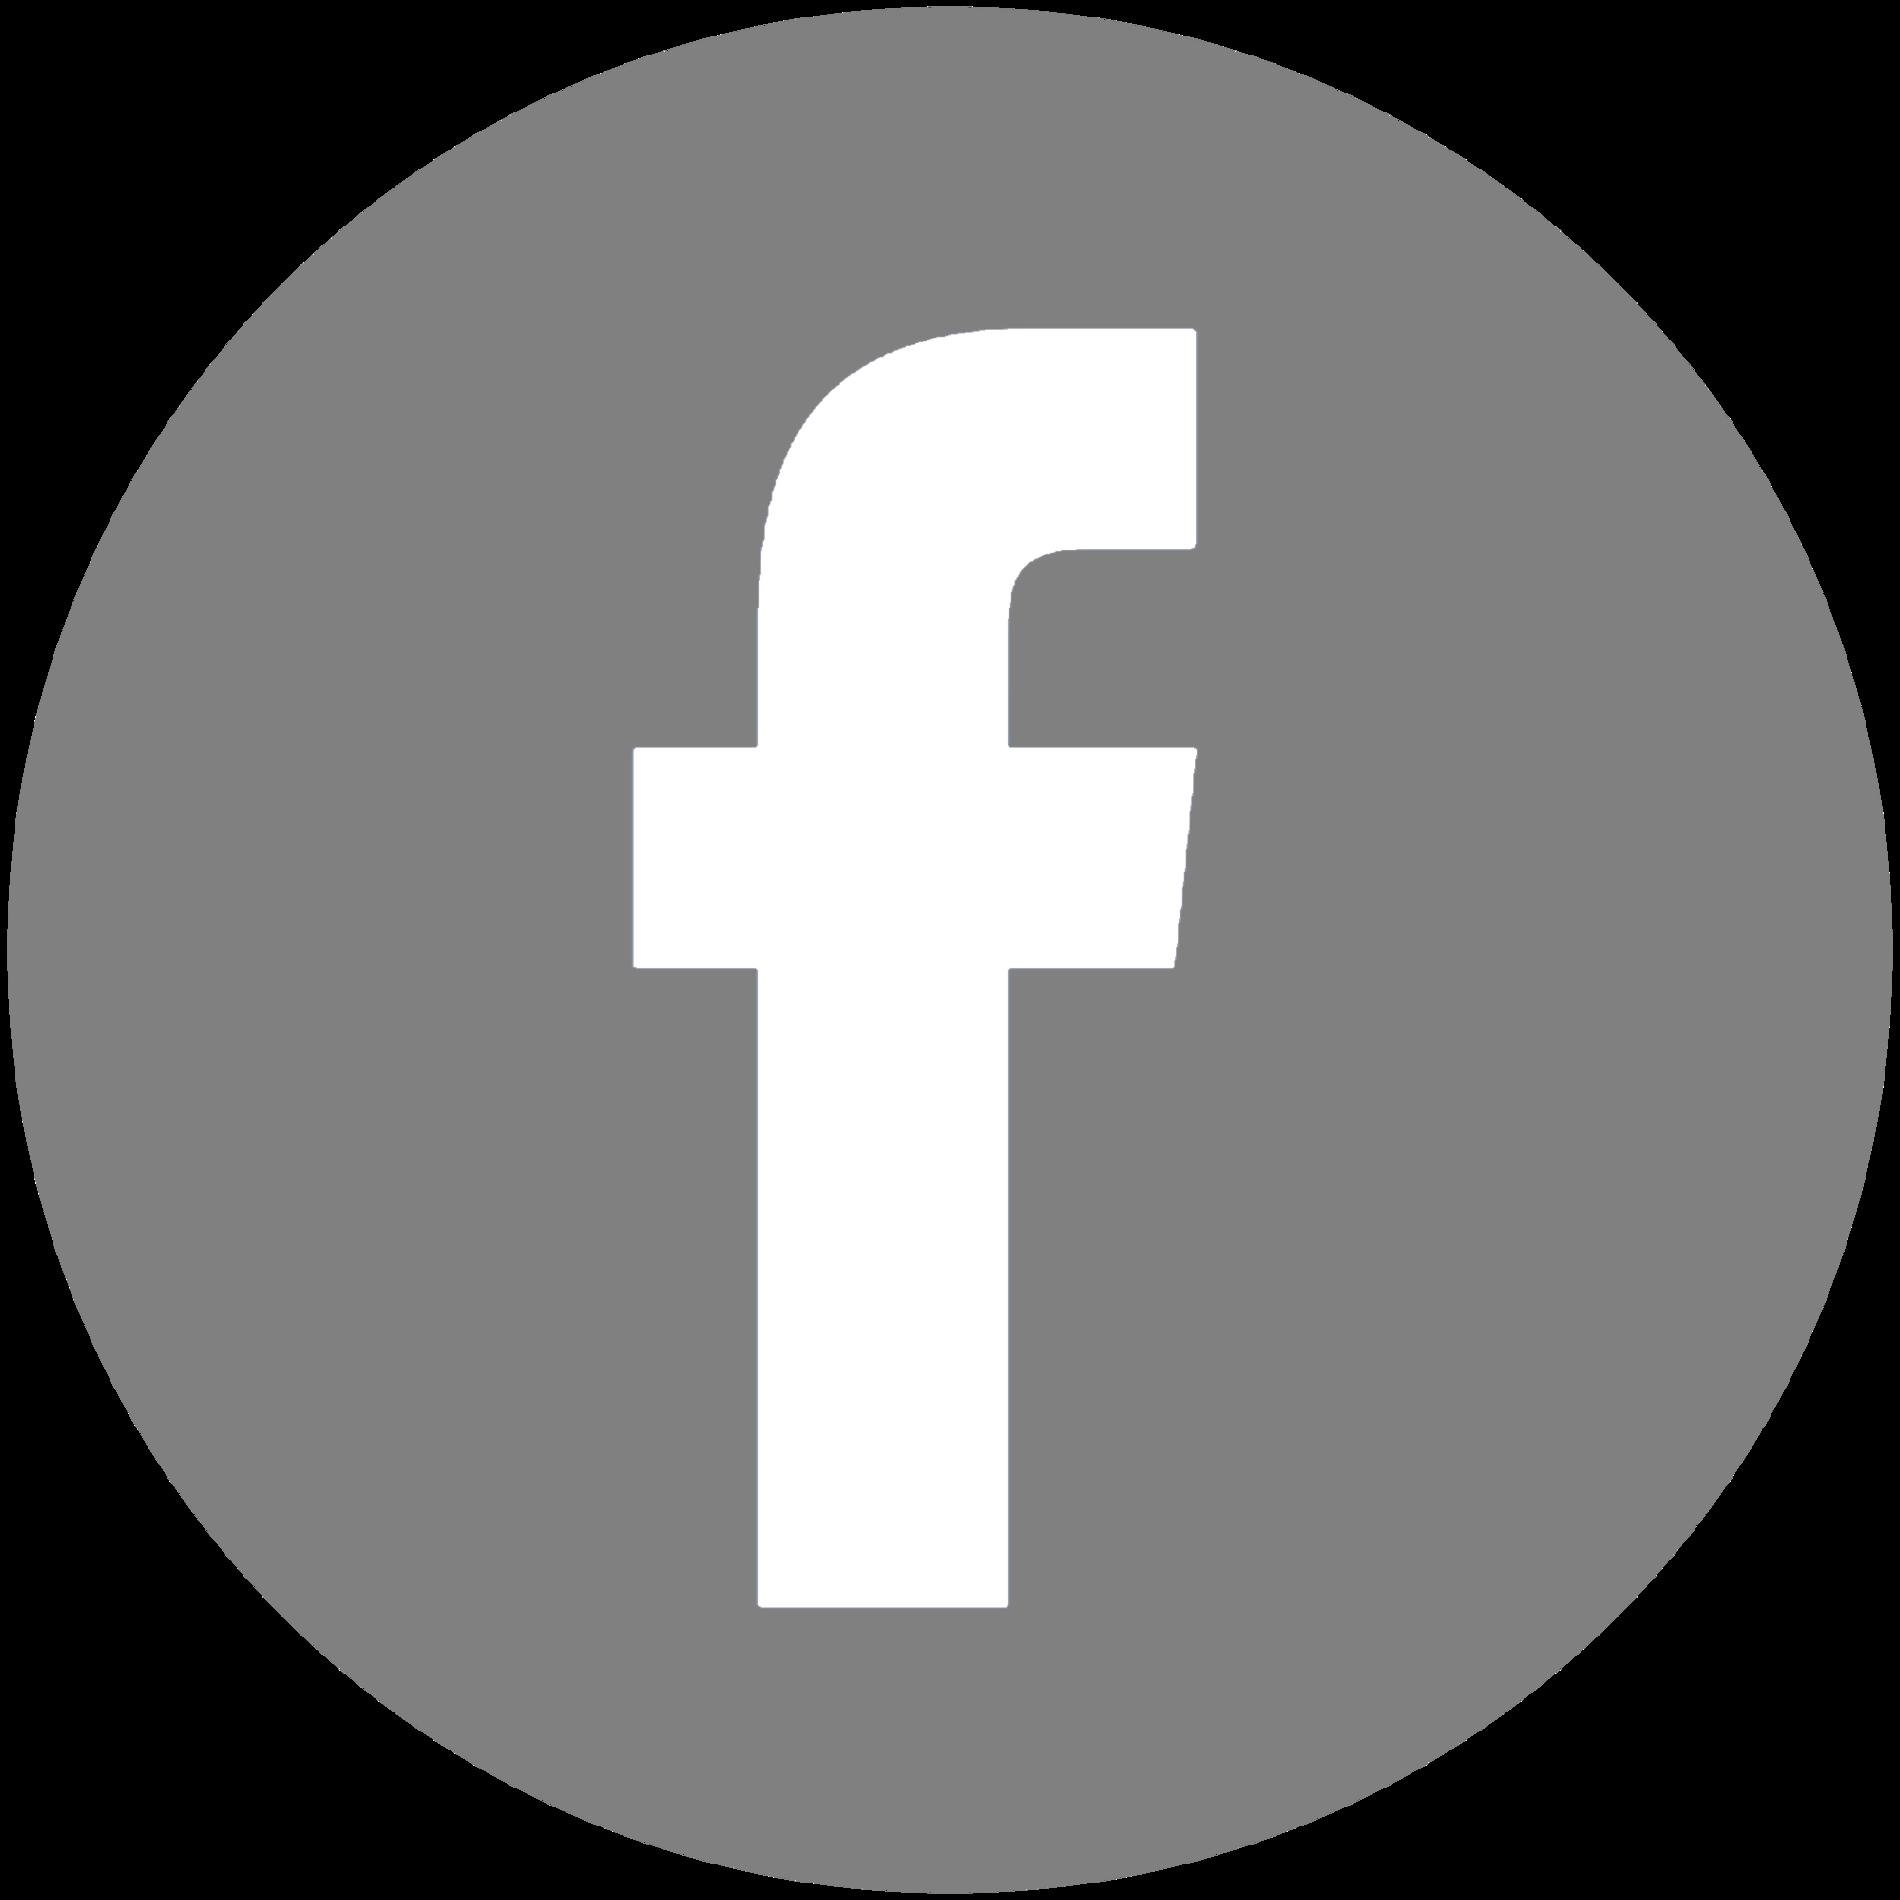 Facebook Clipart Transparent Background.